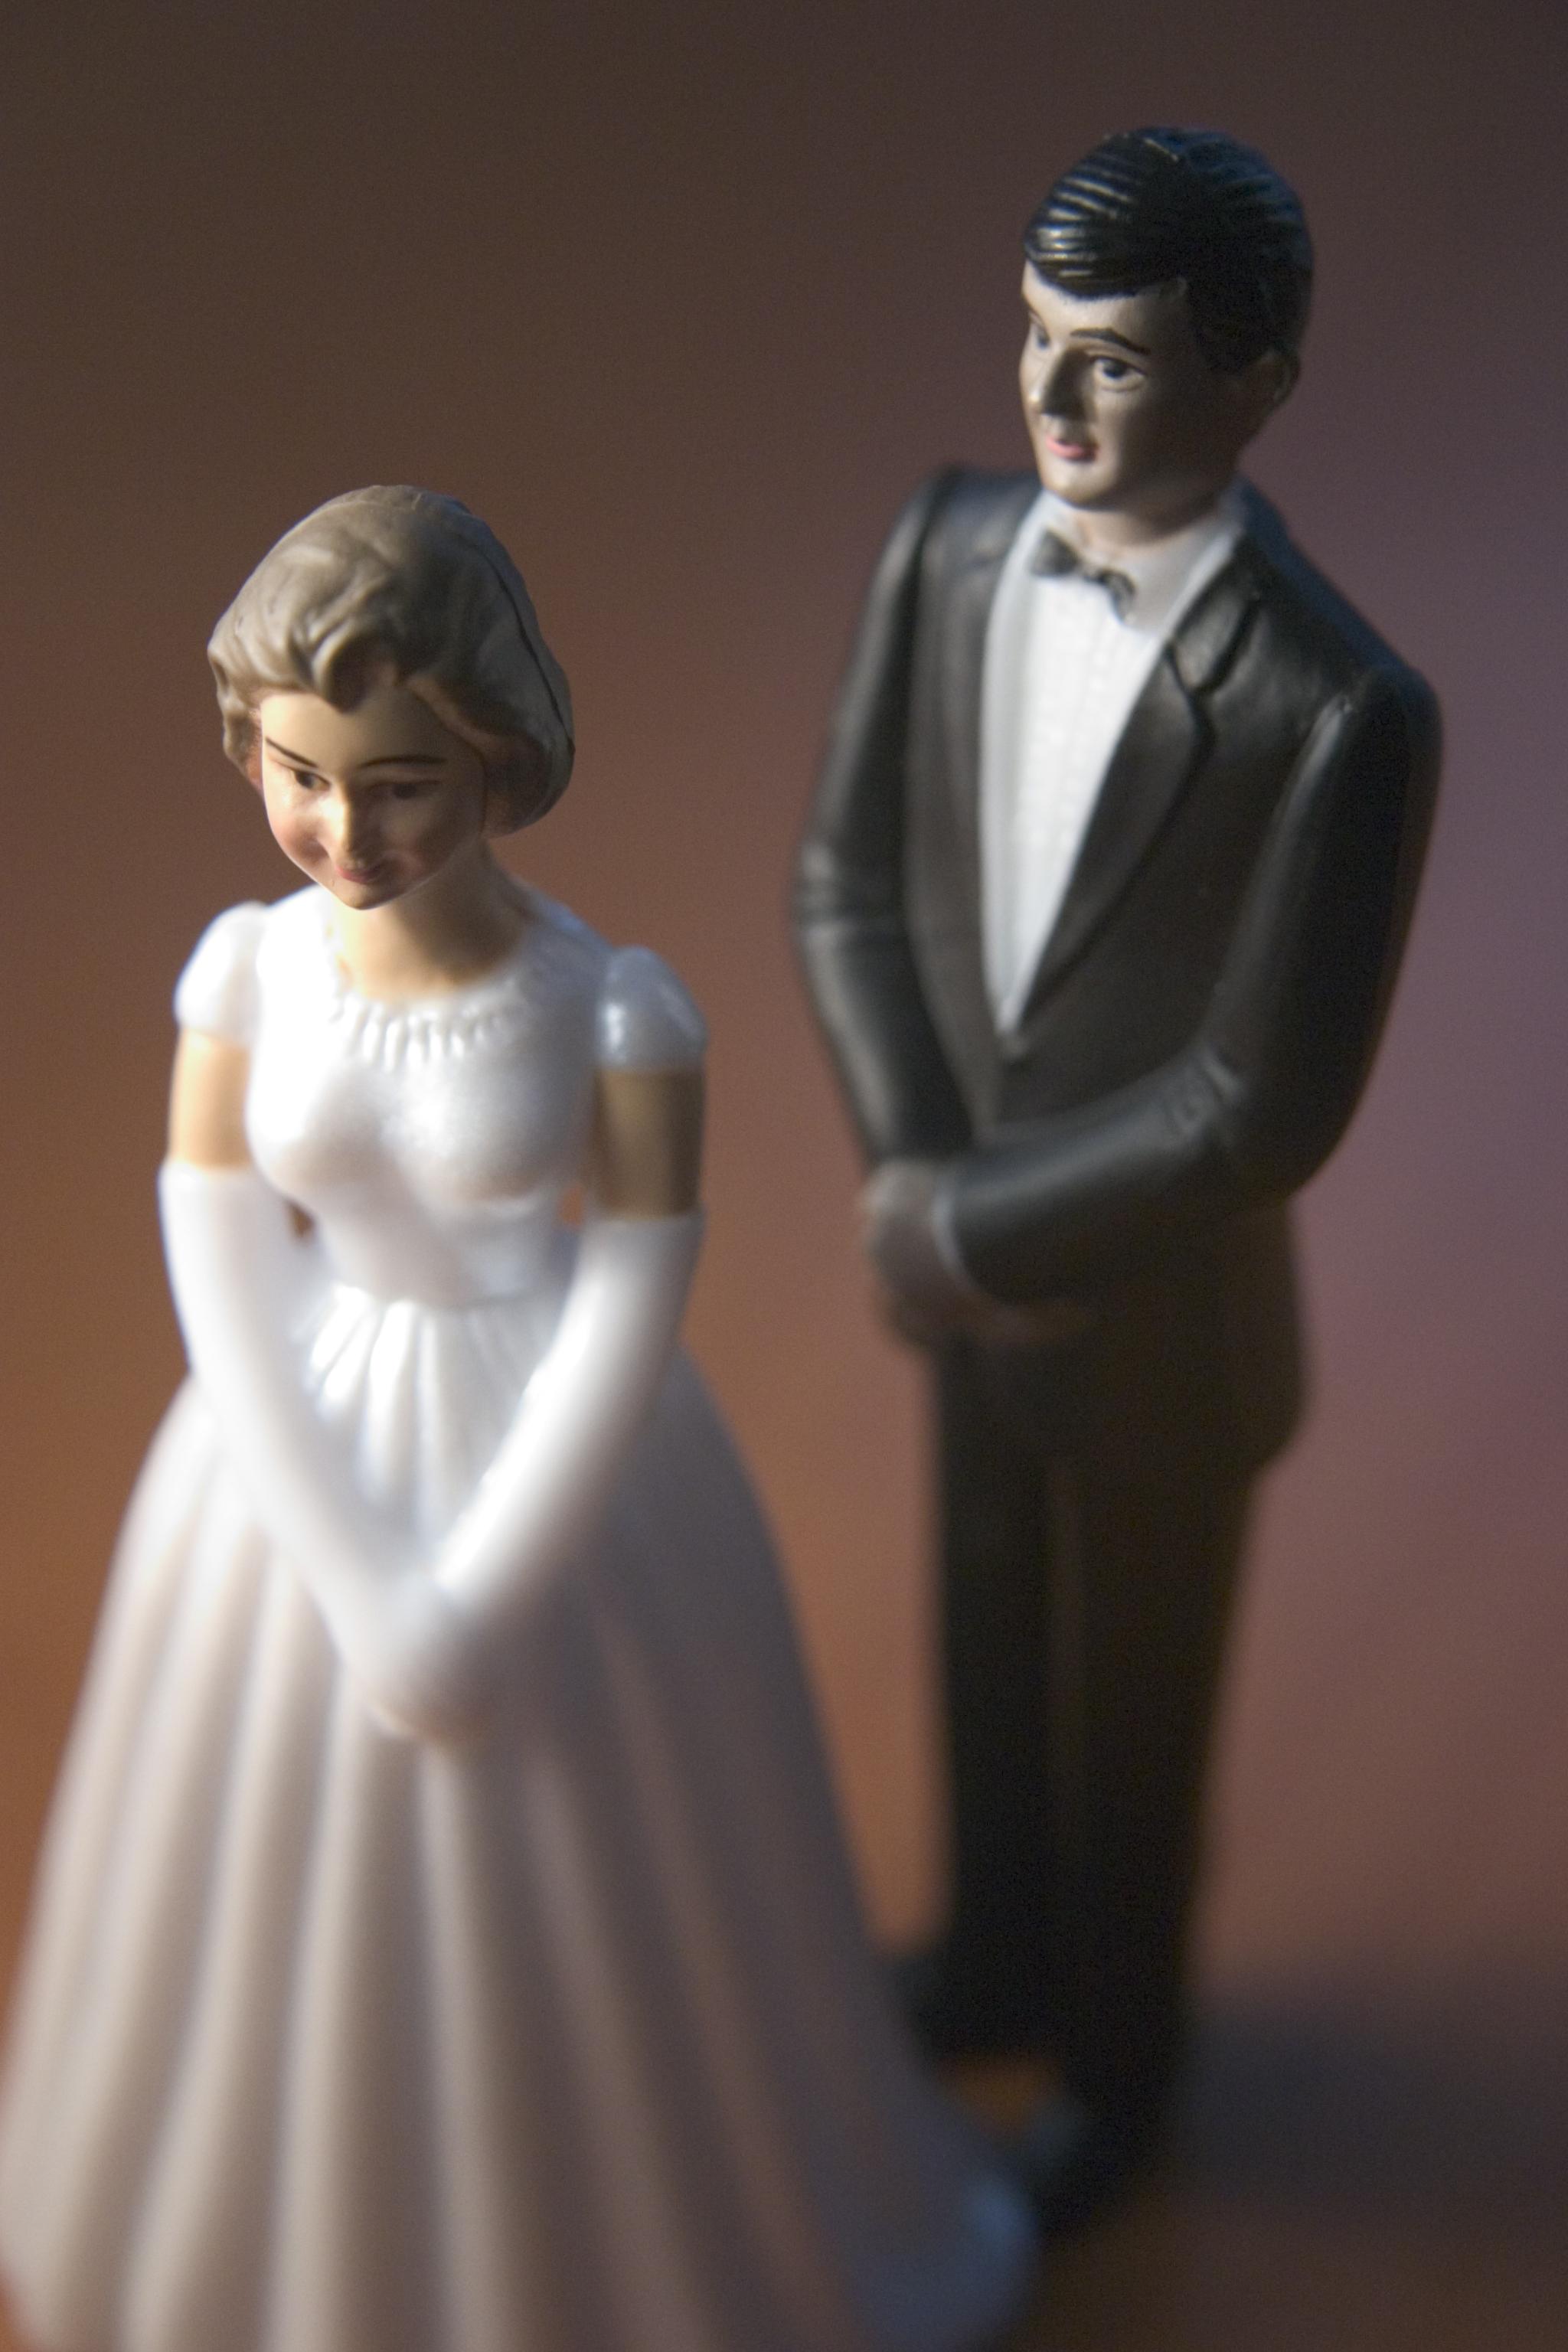 bride-and-groom-figurines-2-1313890